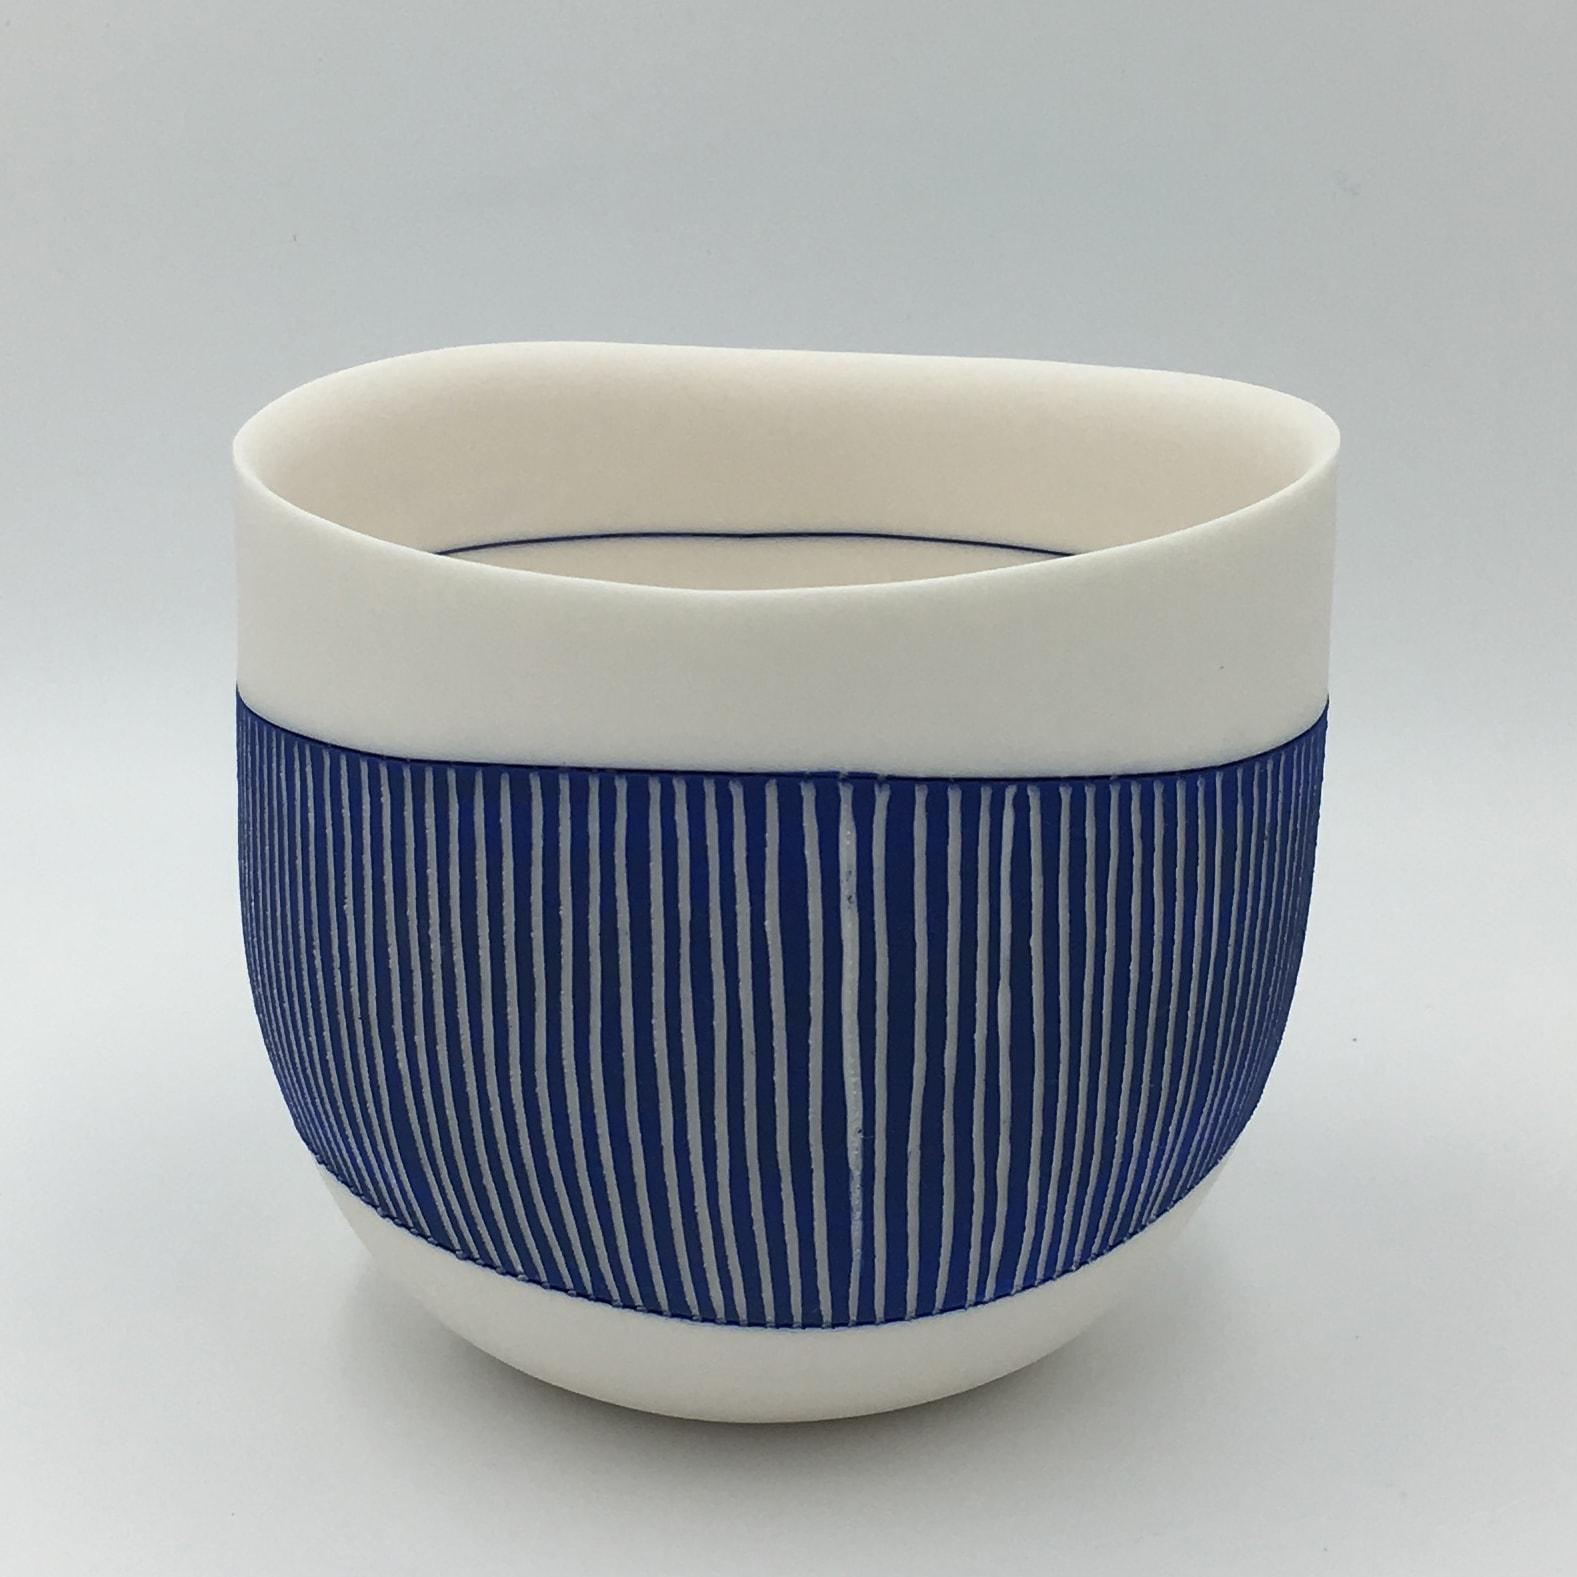 "<span class=""link fancybox-details-link""><a href=""/artists/195-lara-scobie/works/6515-lara-scobie-bowl-with-fine-blue-stripes-2019/"">View Detail Page</a></span><div class=""artist""><strong>Lara Scobie</strong></div> b. 1967 <div class=""title""><em>Bowl with Fine Blue Stripes</em>, 2019</div> <div class=""medium"">Porcelain</div><div class=""copyright_line"">Own Art: £28 x 10 Months, 0% APR</div>"